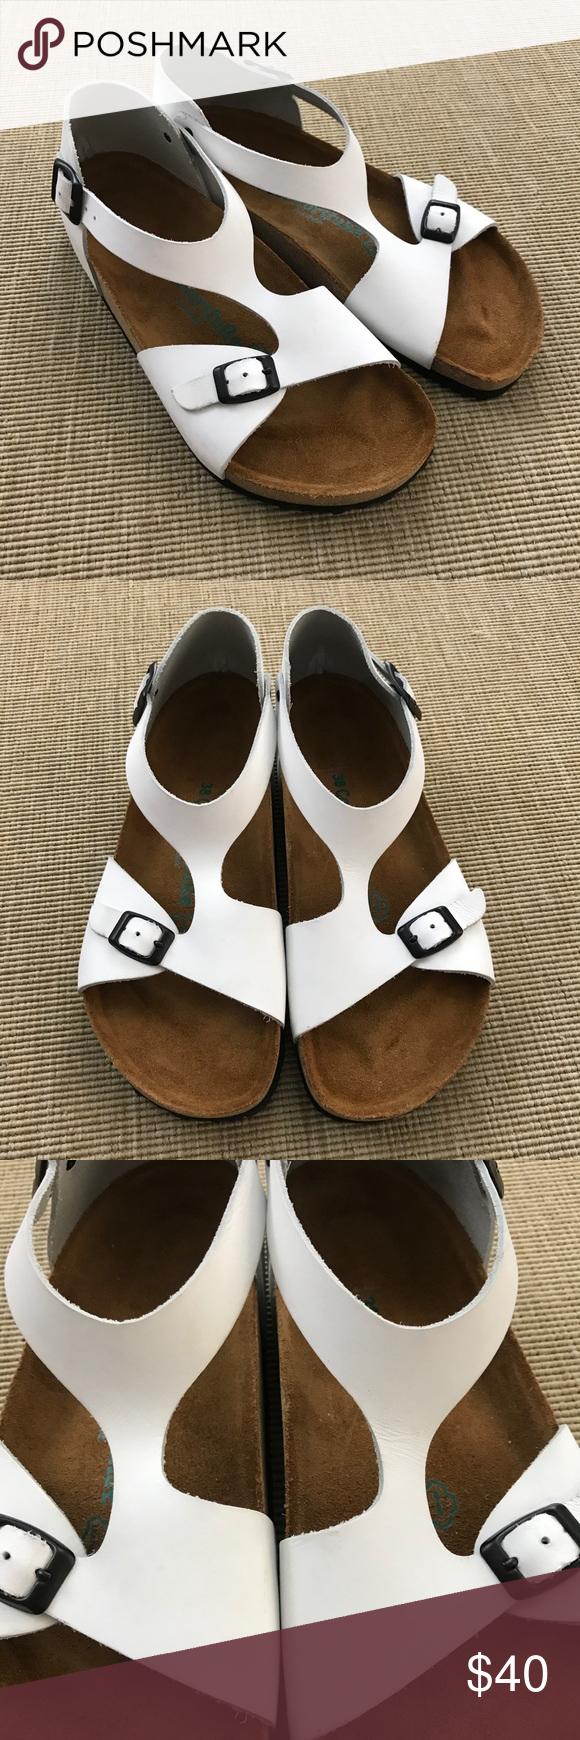 Sandals 38 New T Strap Comfortfusse Cajls453rq White Eu Size thxrQCsd